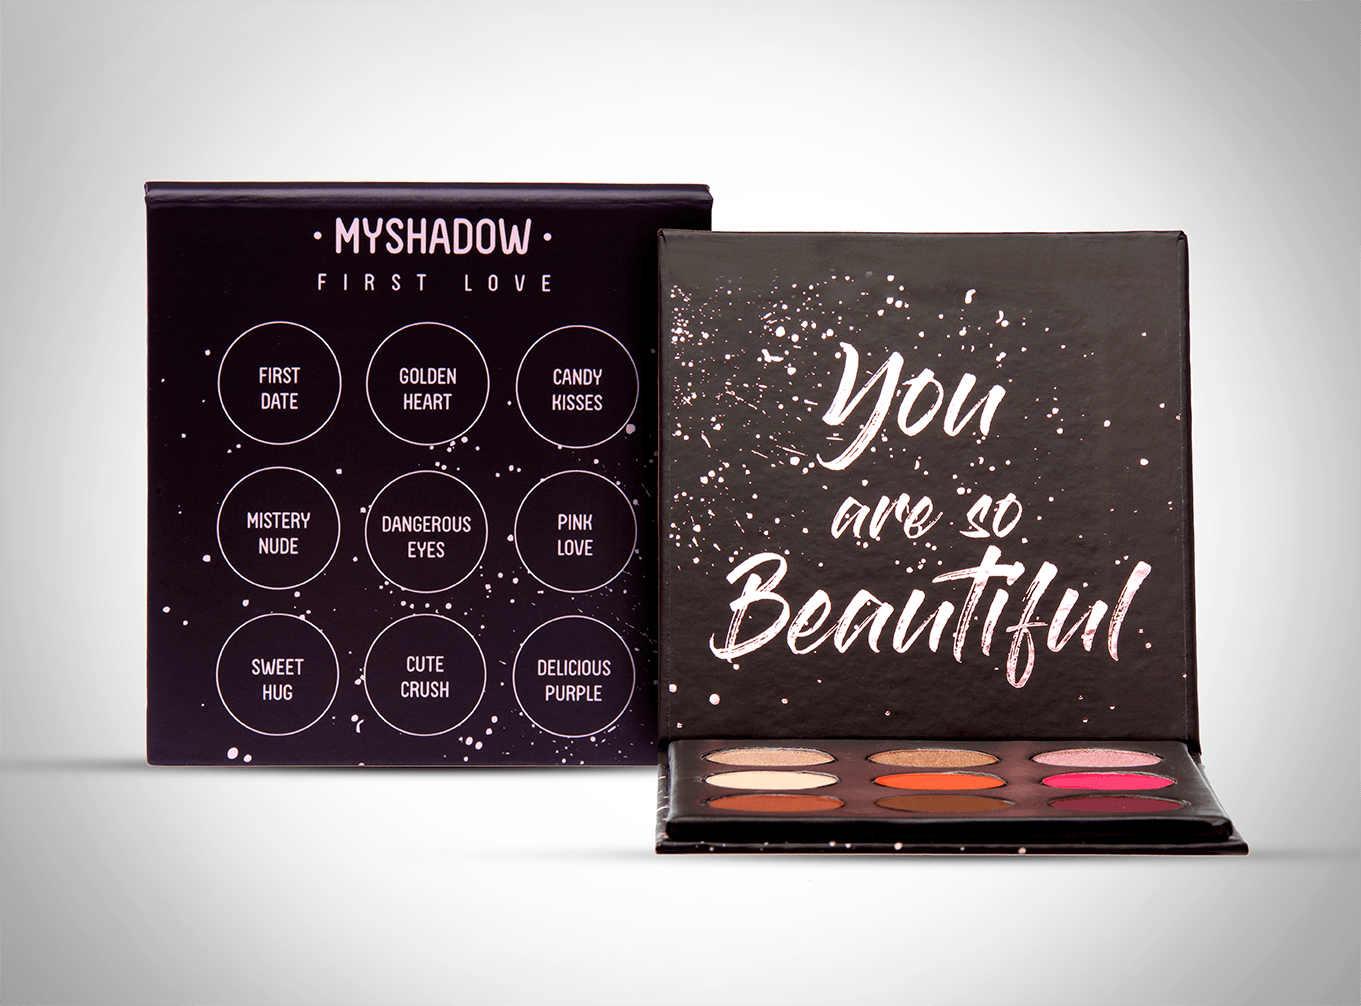 Paleta de Sombras - MyShadow Mayore Beauty